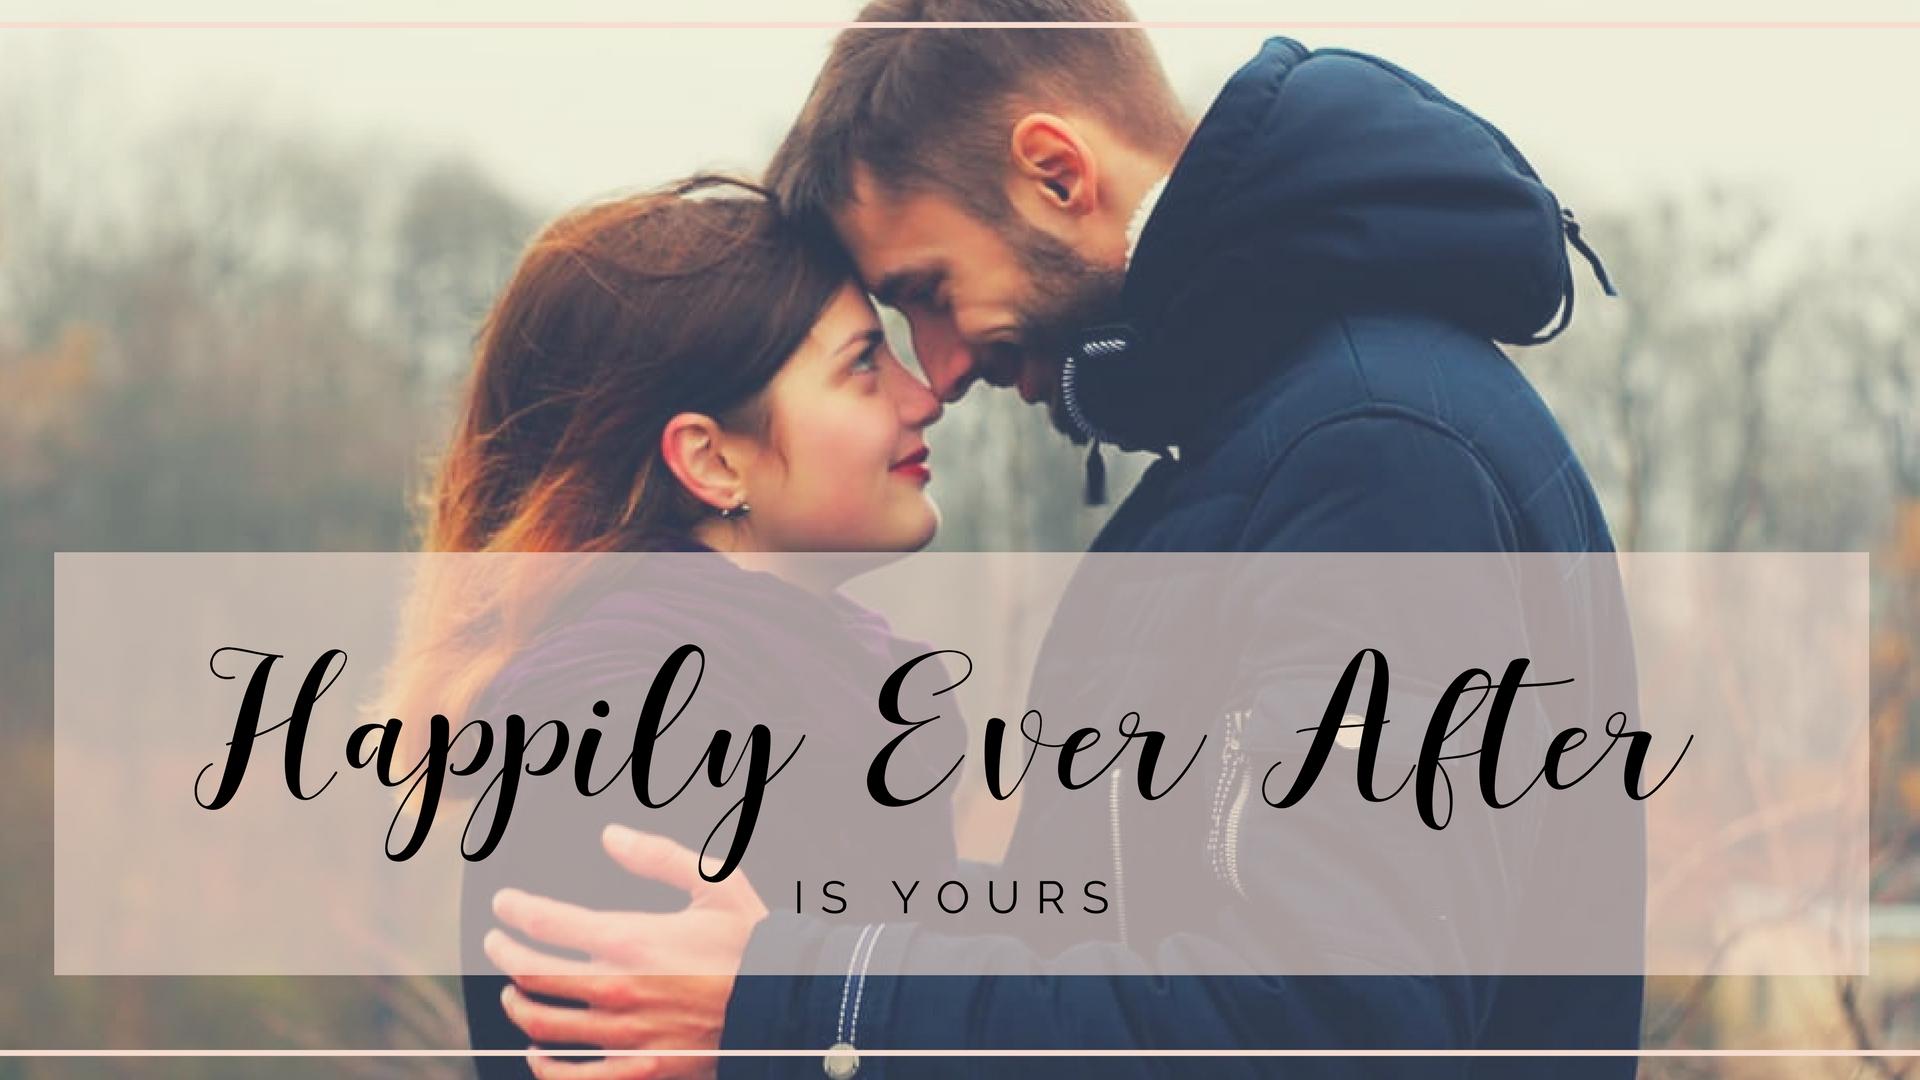 http://emyraldsinclaire.com/happily-ever-after-2/